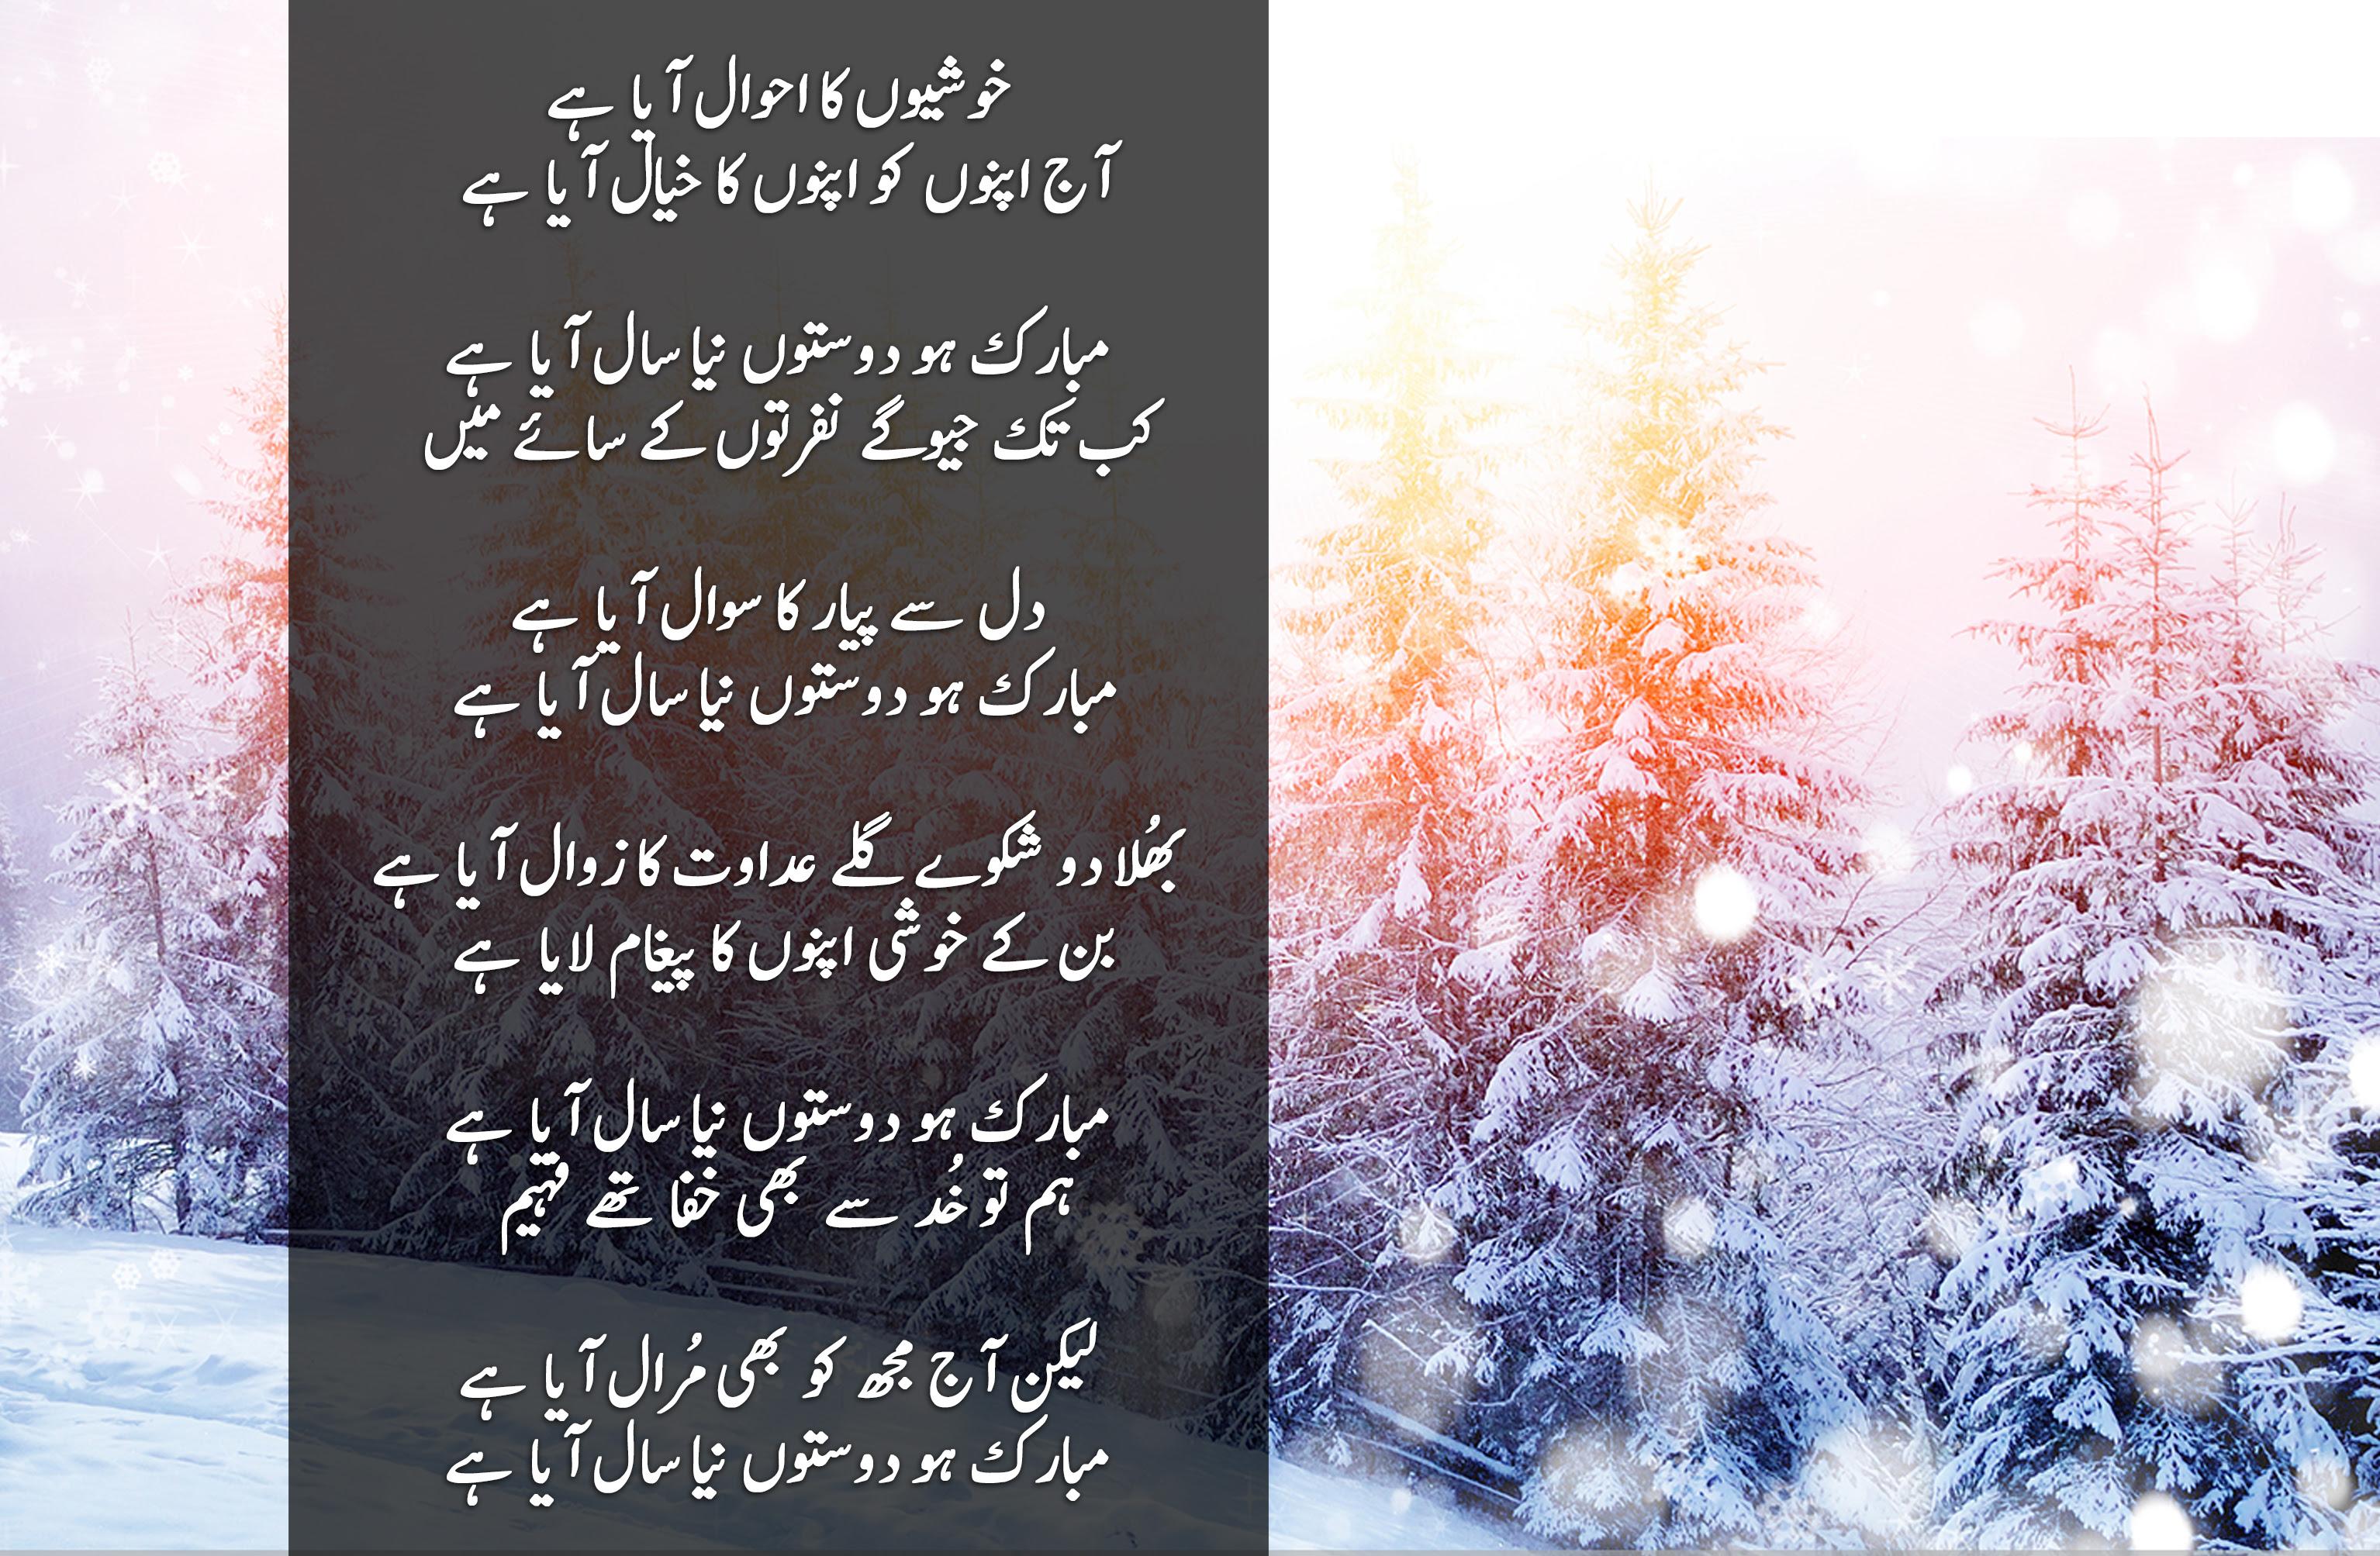 Mirza Ghalib Poetry Shayari Hamariwebcom